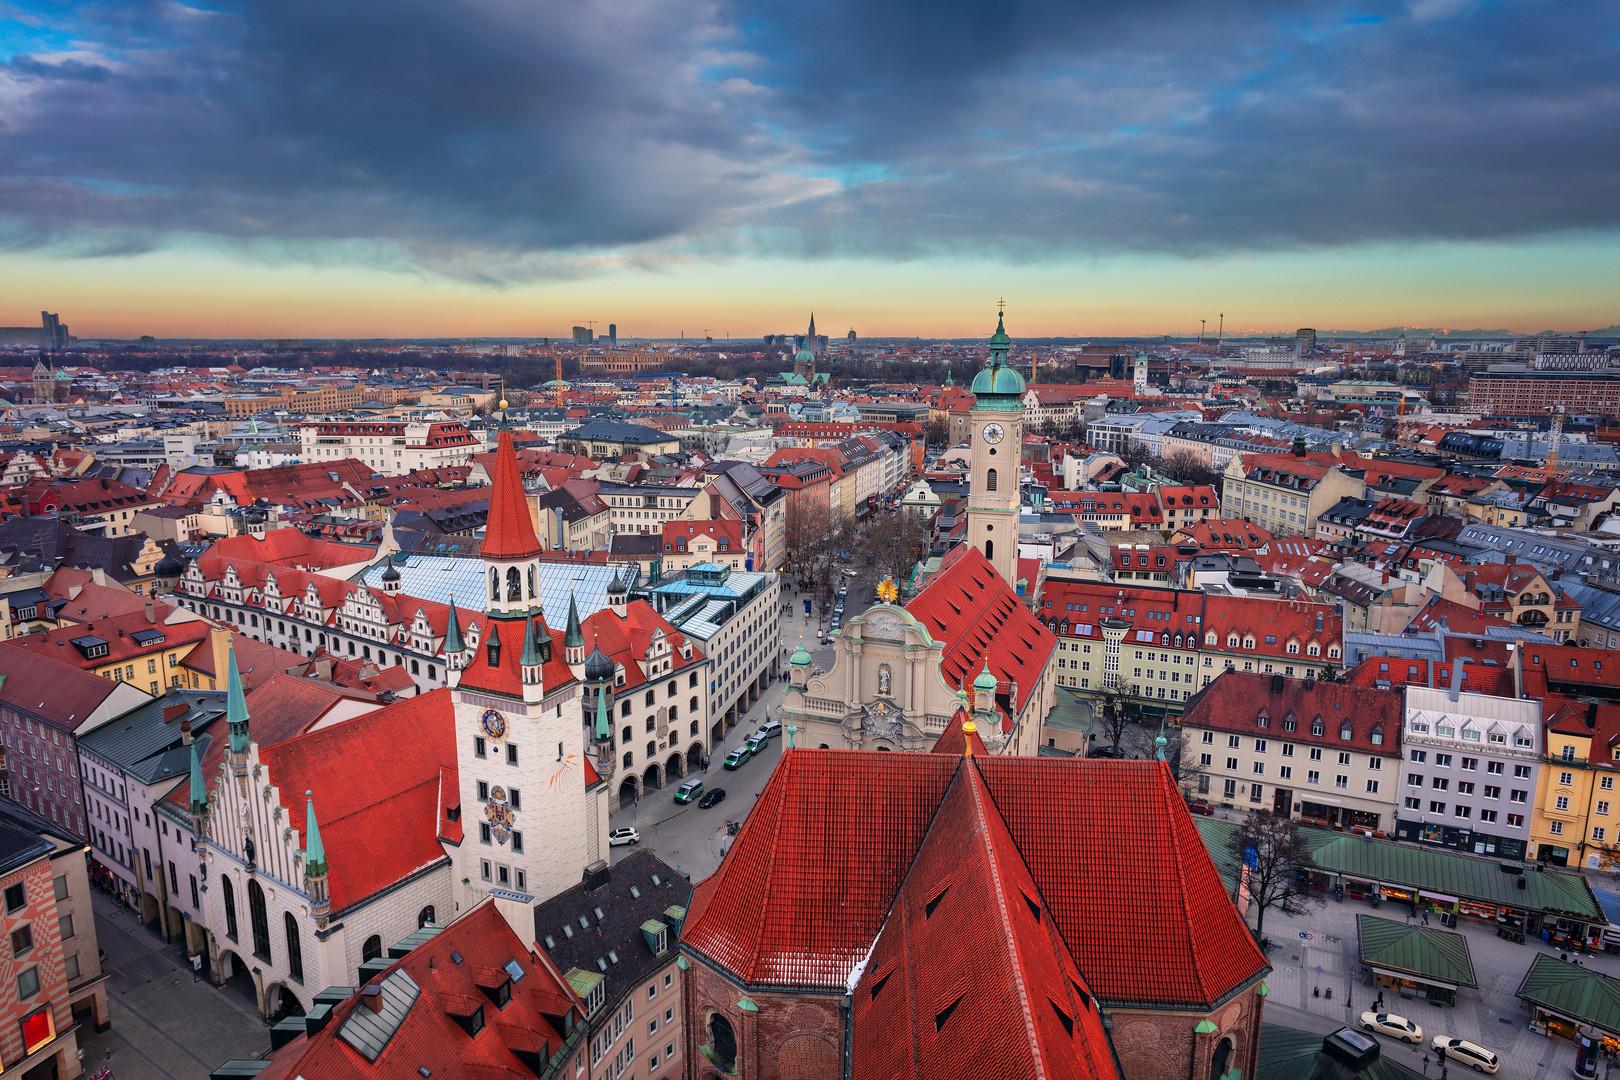 bigstock-Munich-Aerial-Cityscape-Image-2